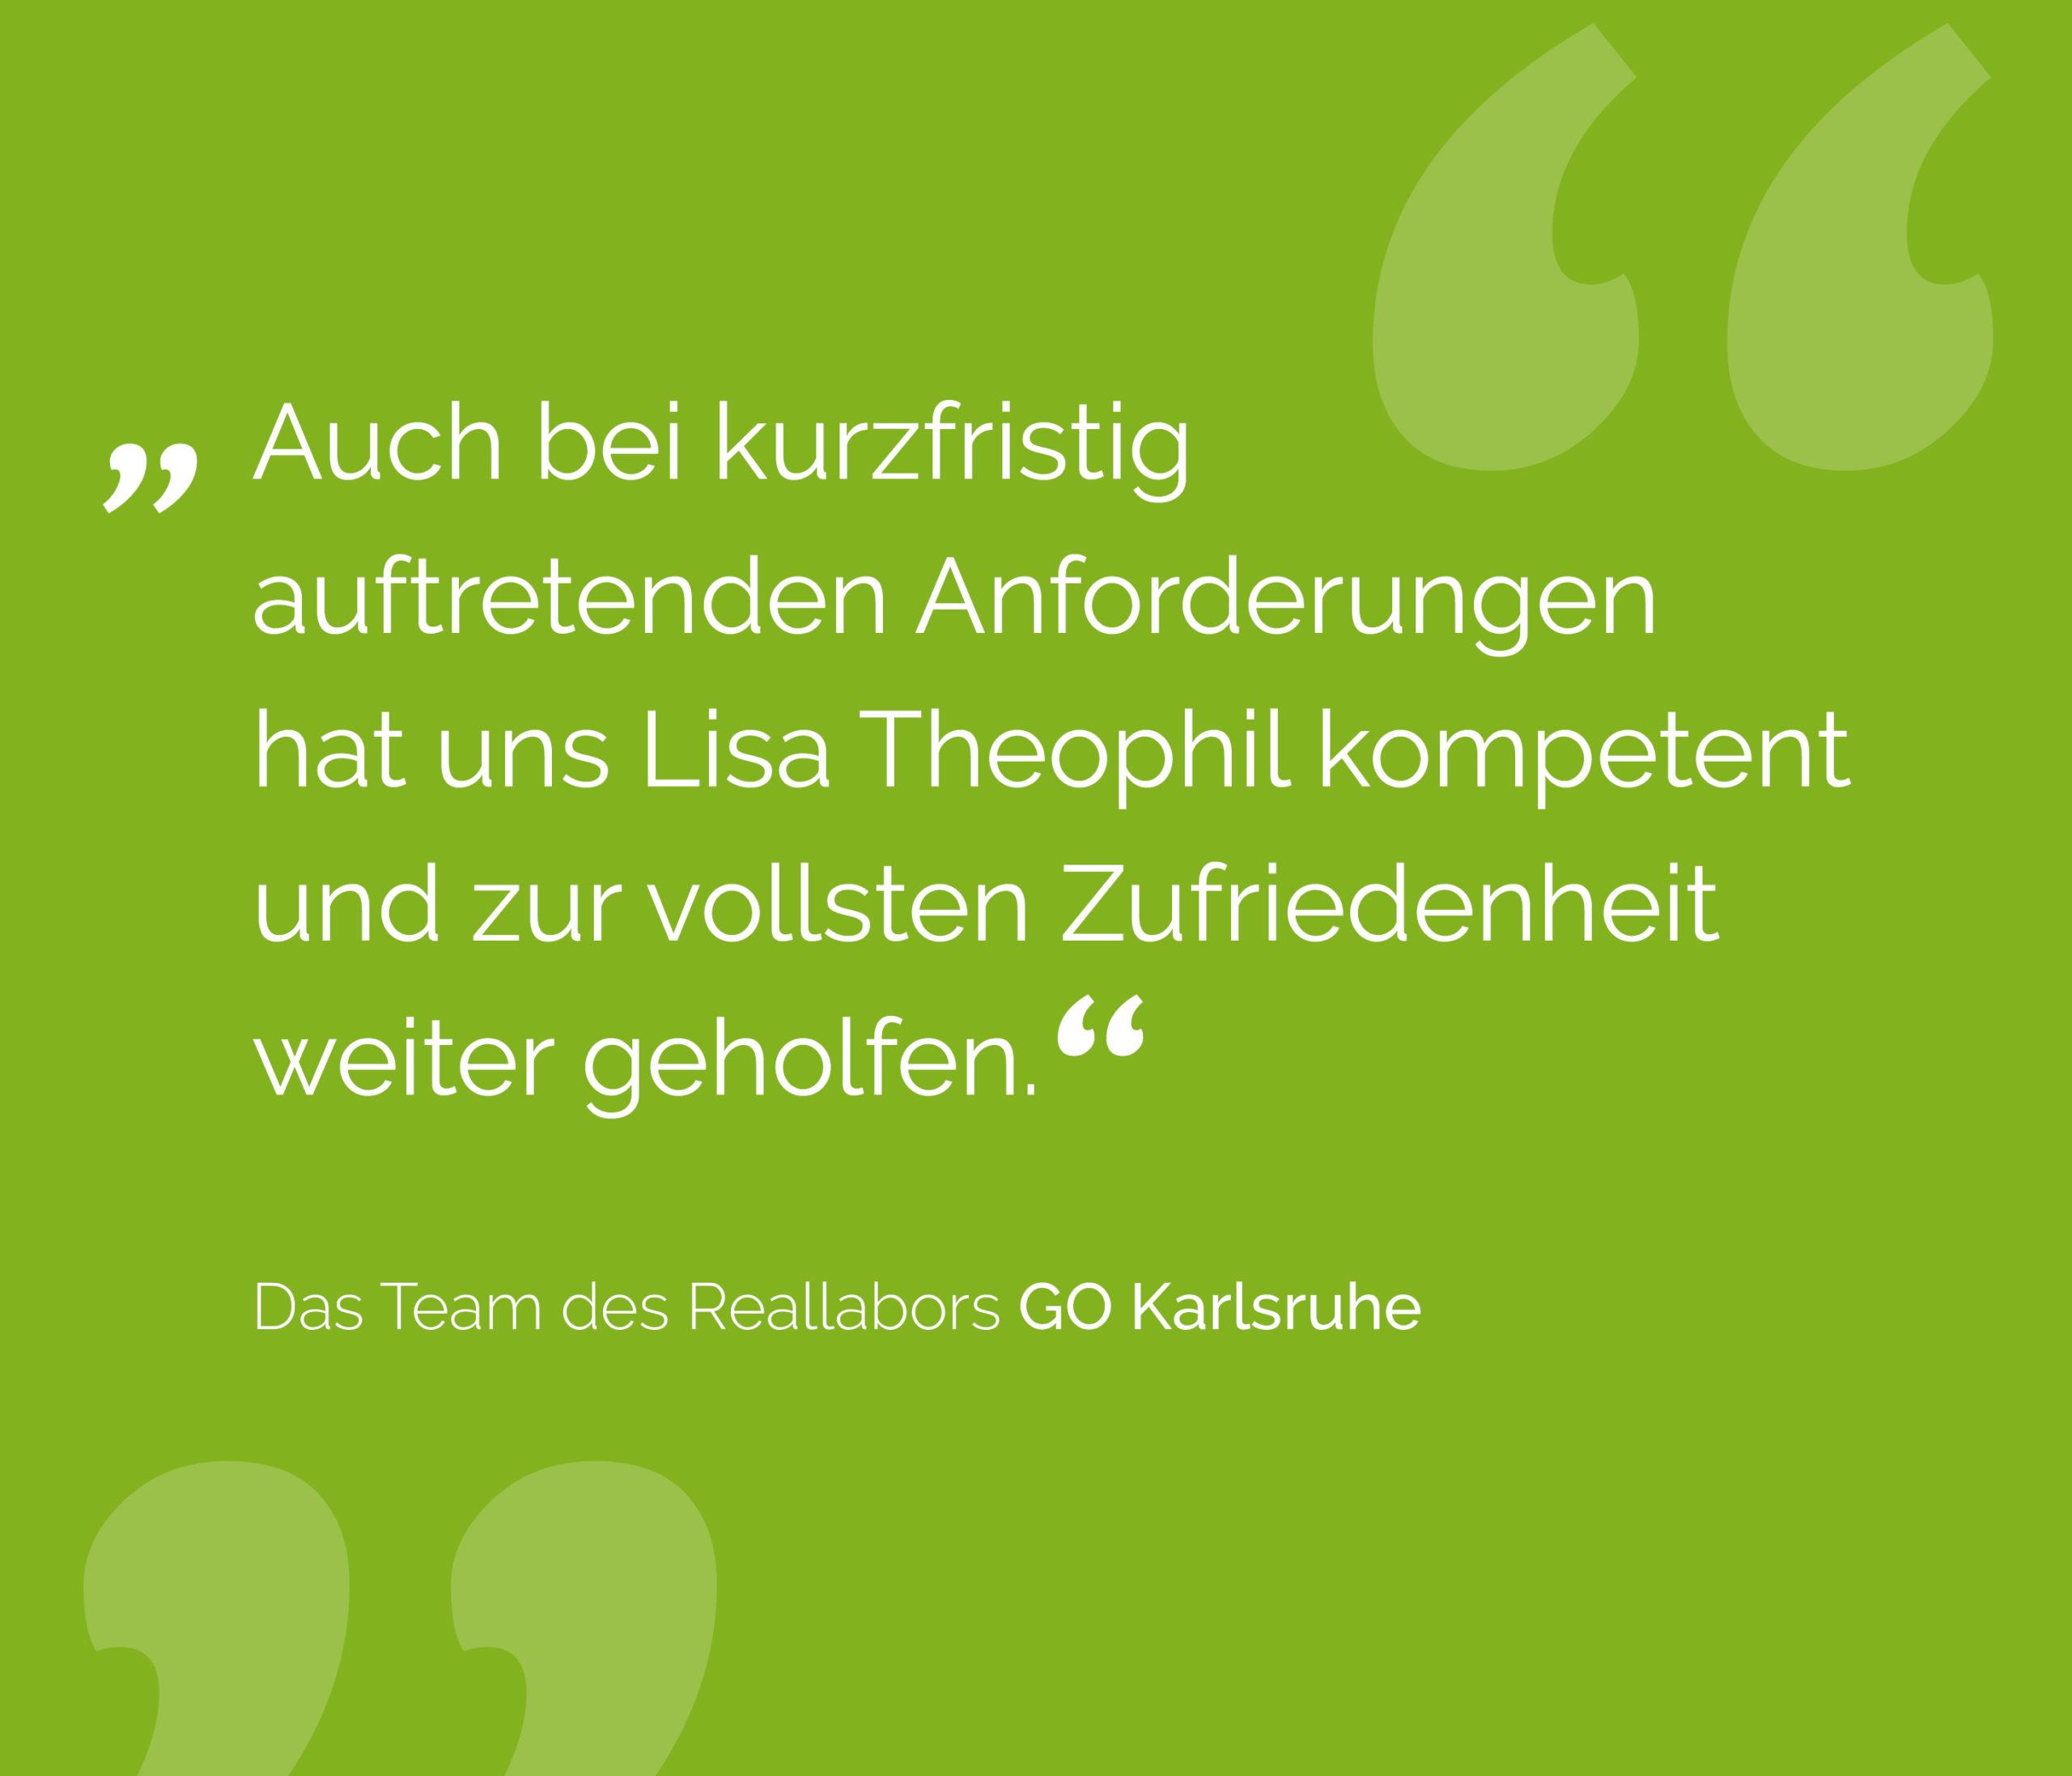 Kundenfeedback Reallabor GO Karlsruhe